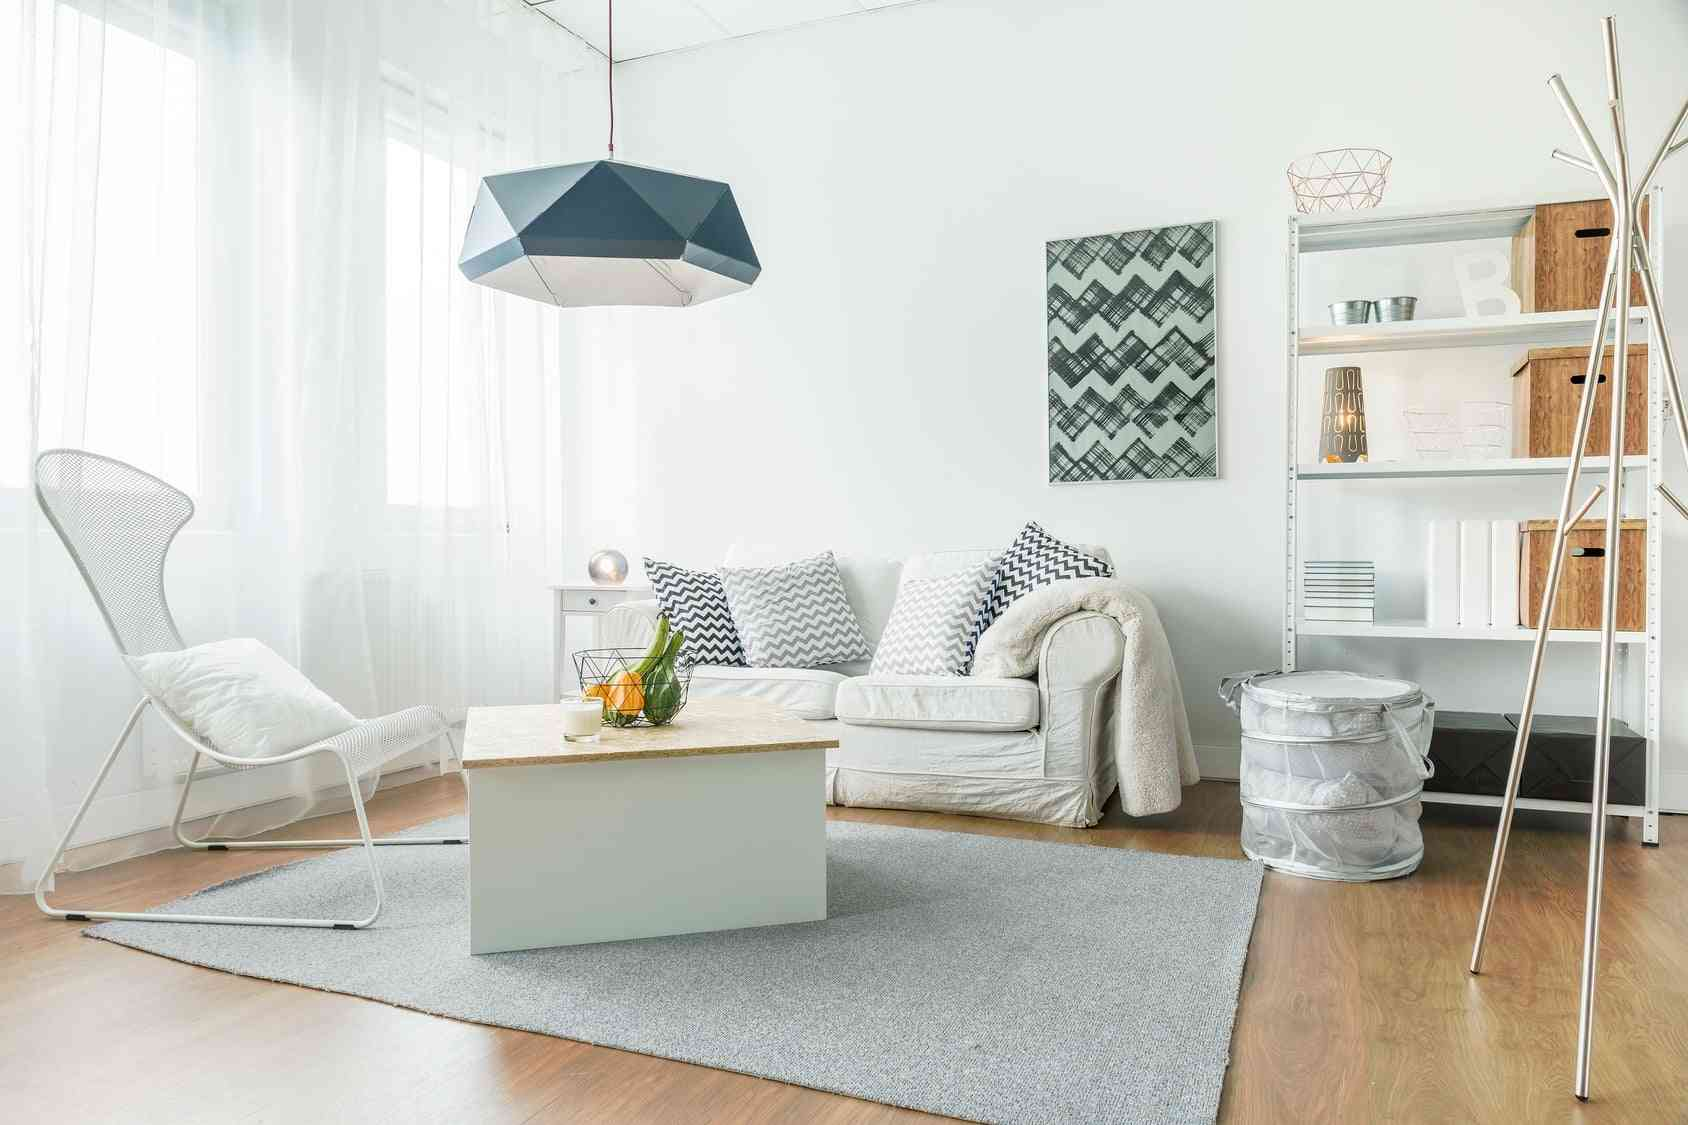 Trendy furniture in room